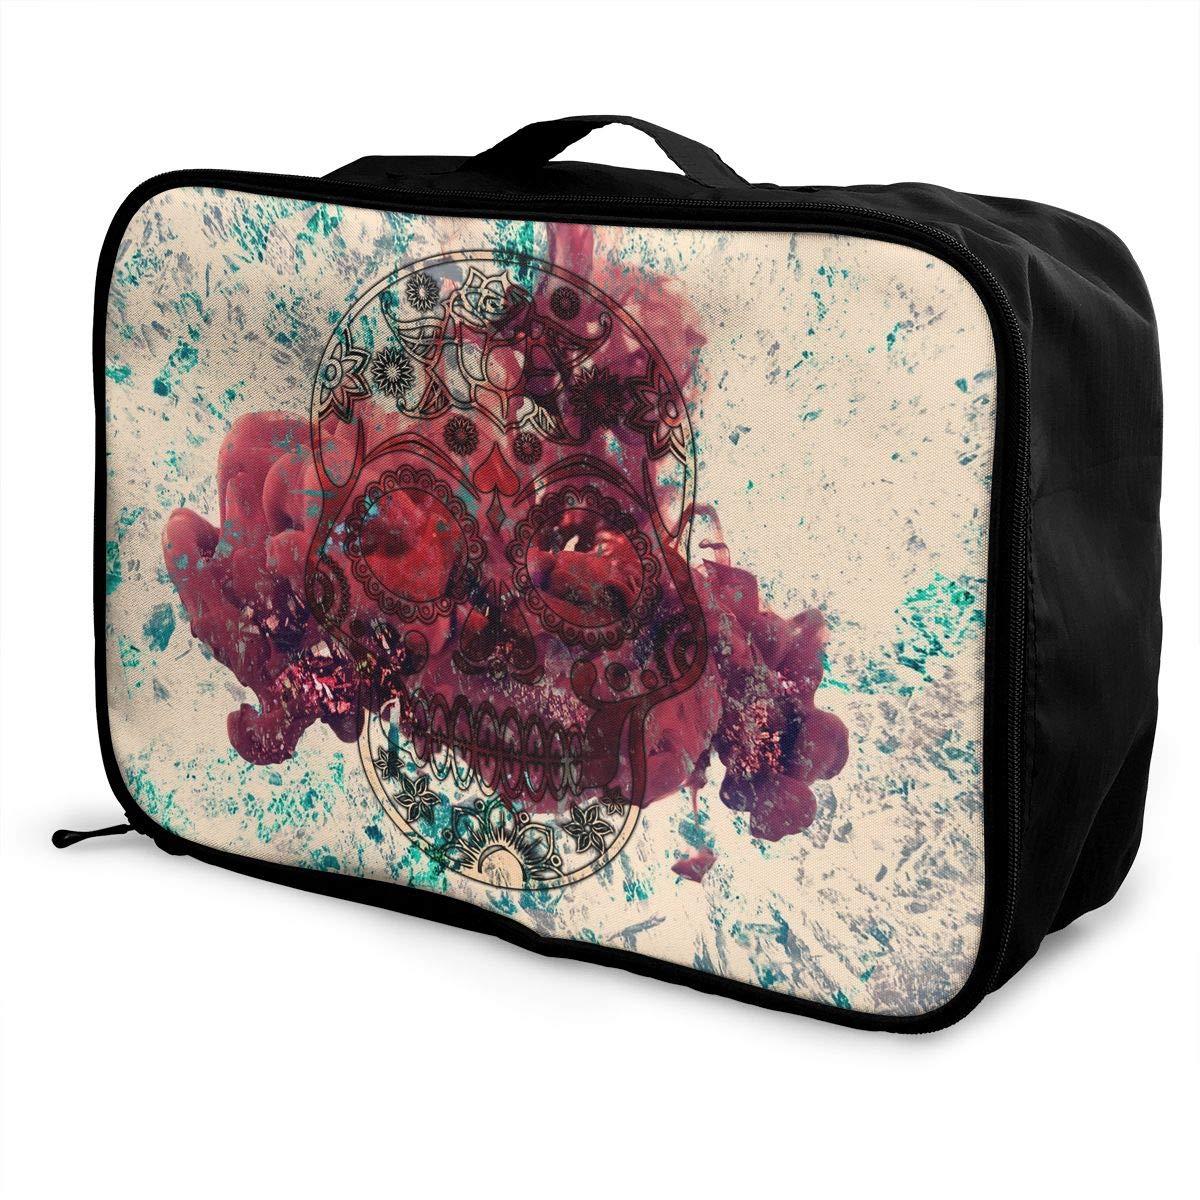 Travel Luggage Duffle Bag Lightweight Portable Handbag Skull Large Capacity Waterproof Foldable Storage Tote